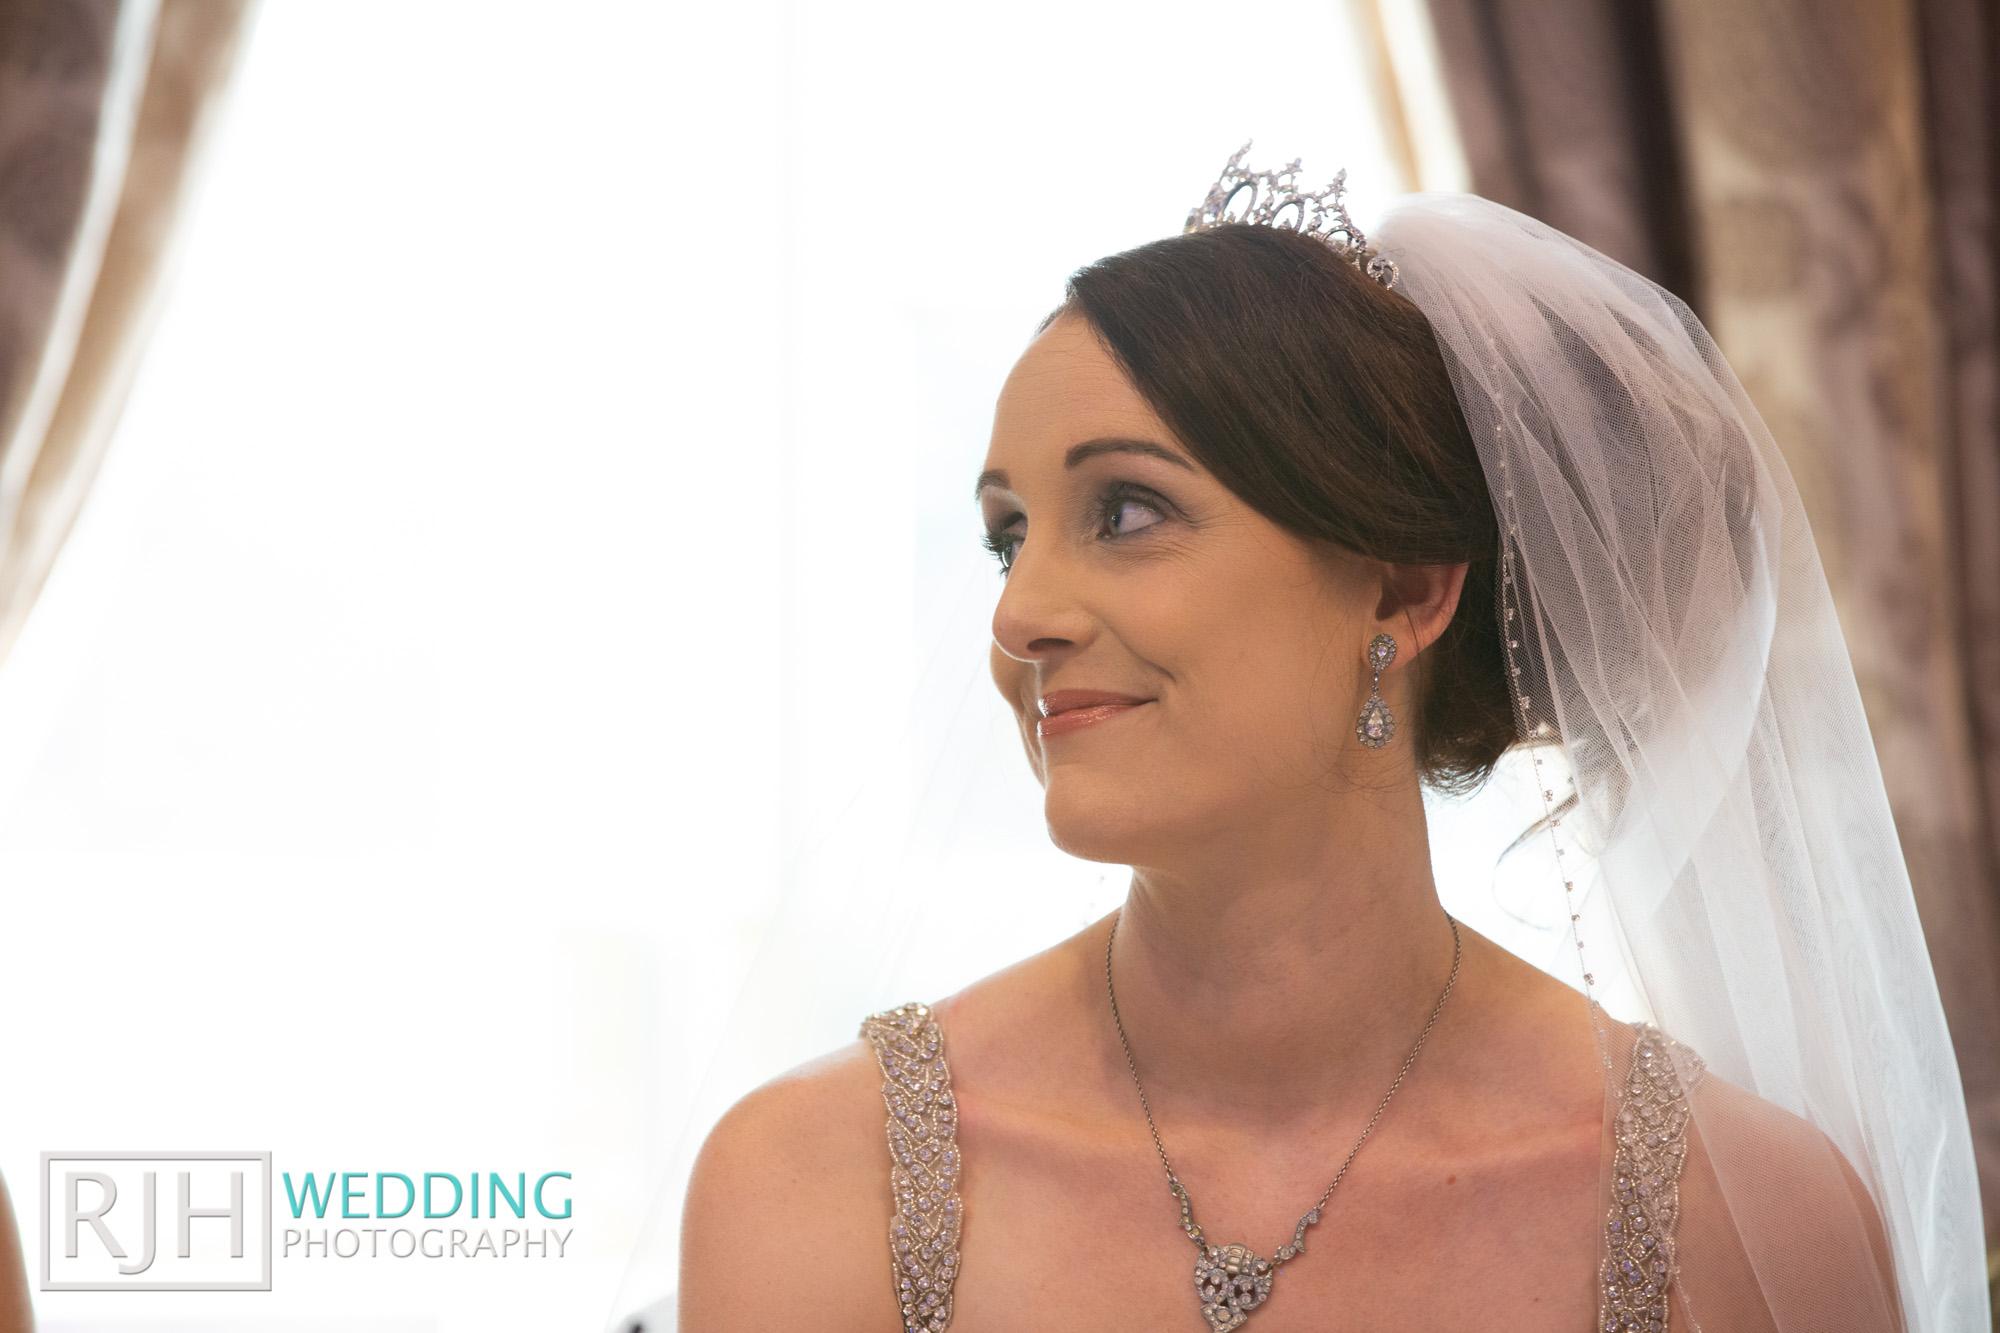 Oulton Hall Wedding Photography_Goodwill-Hall_034_RJH17825.jpg